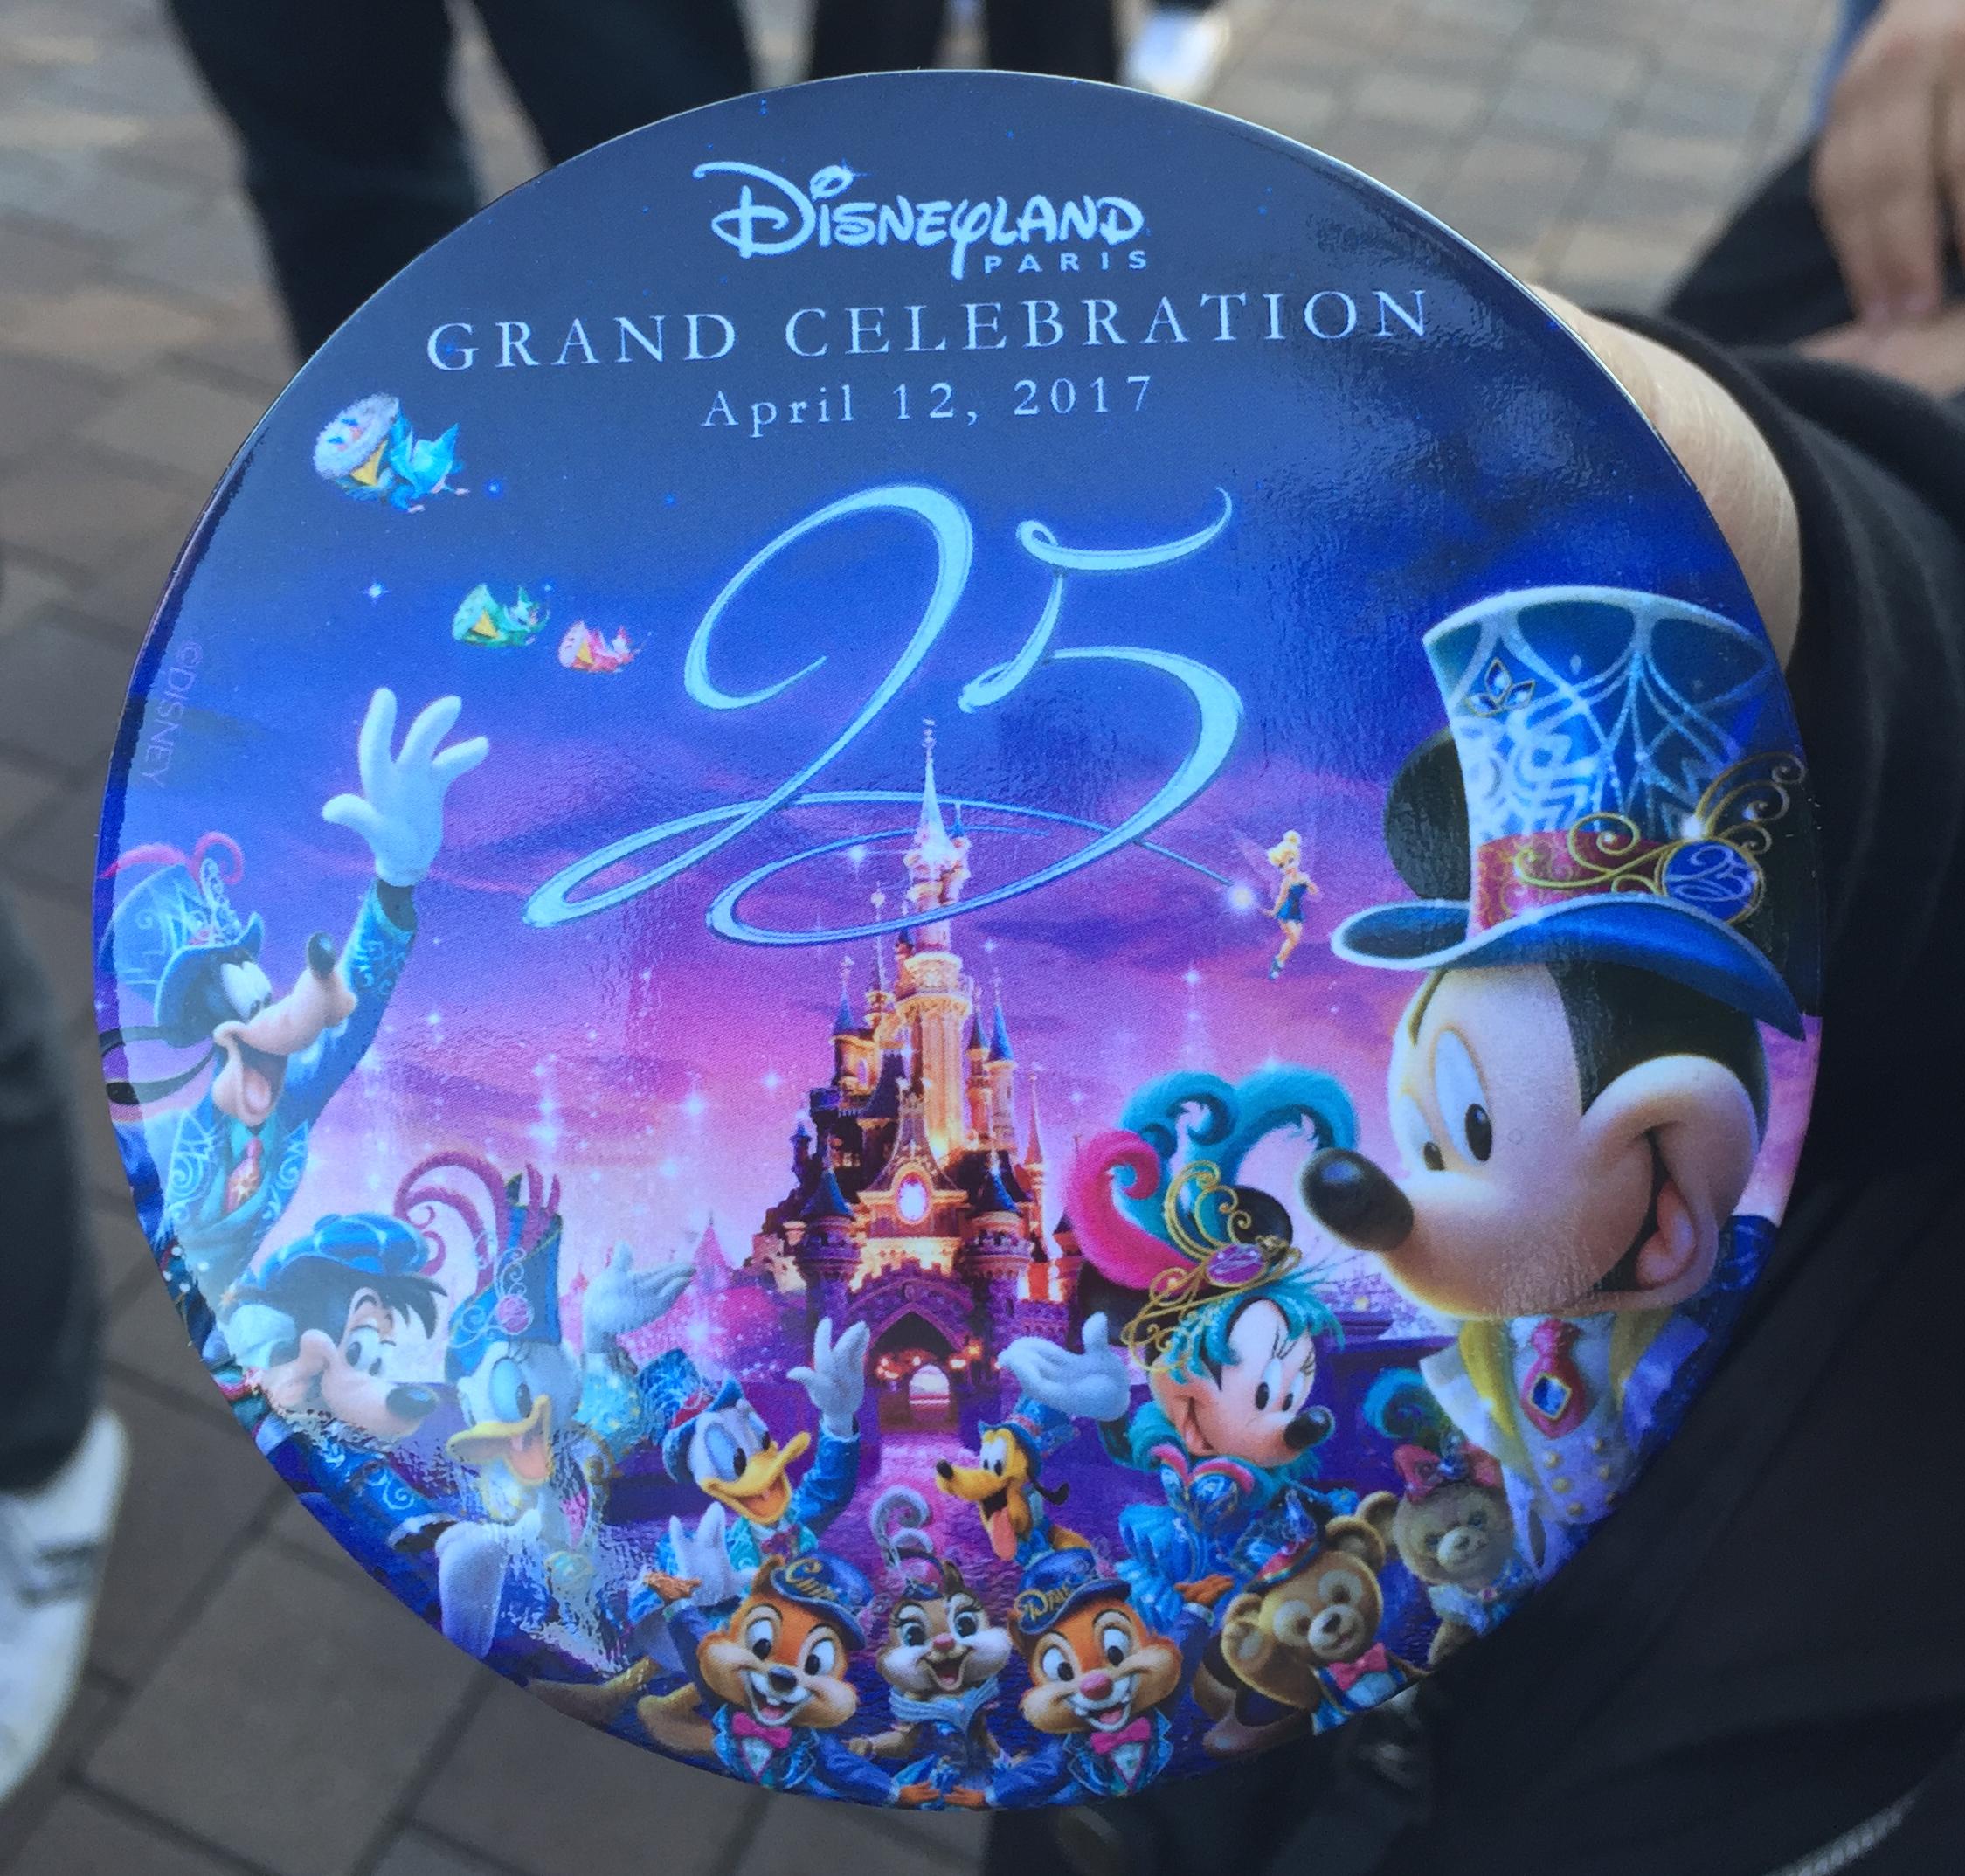 grande_celebration_disneyland_paris